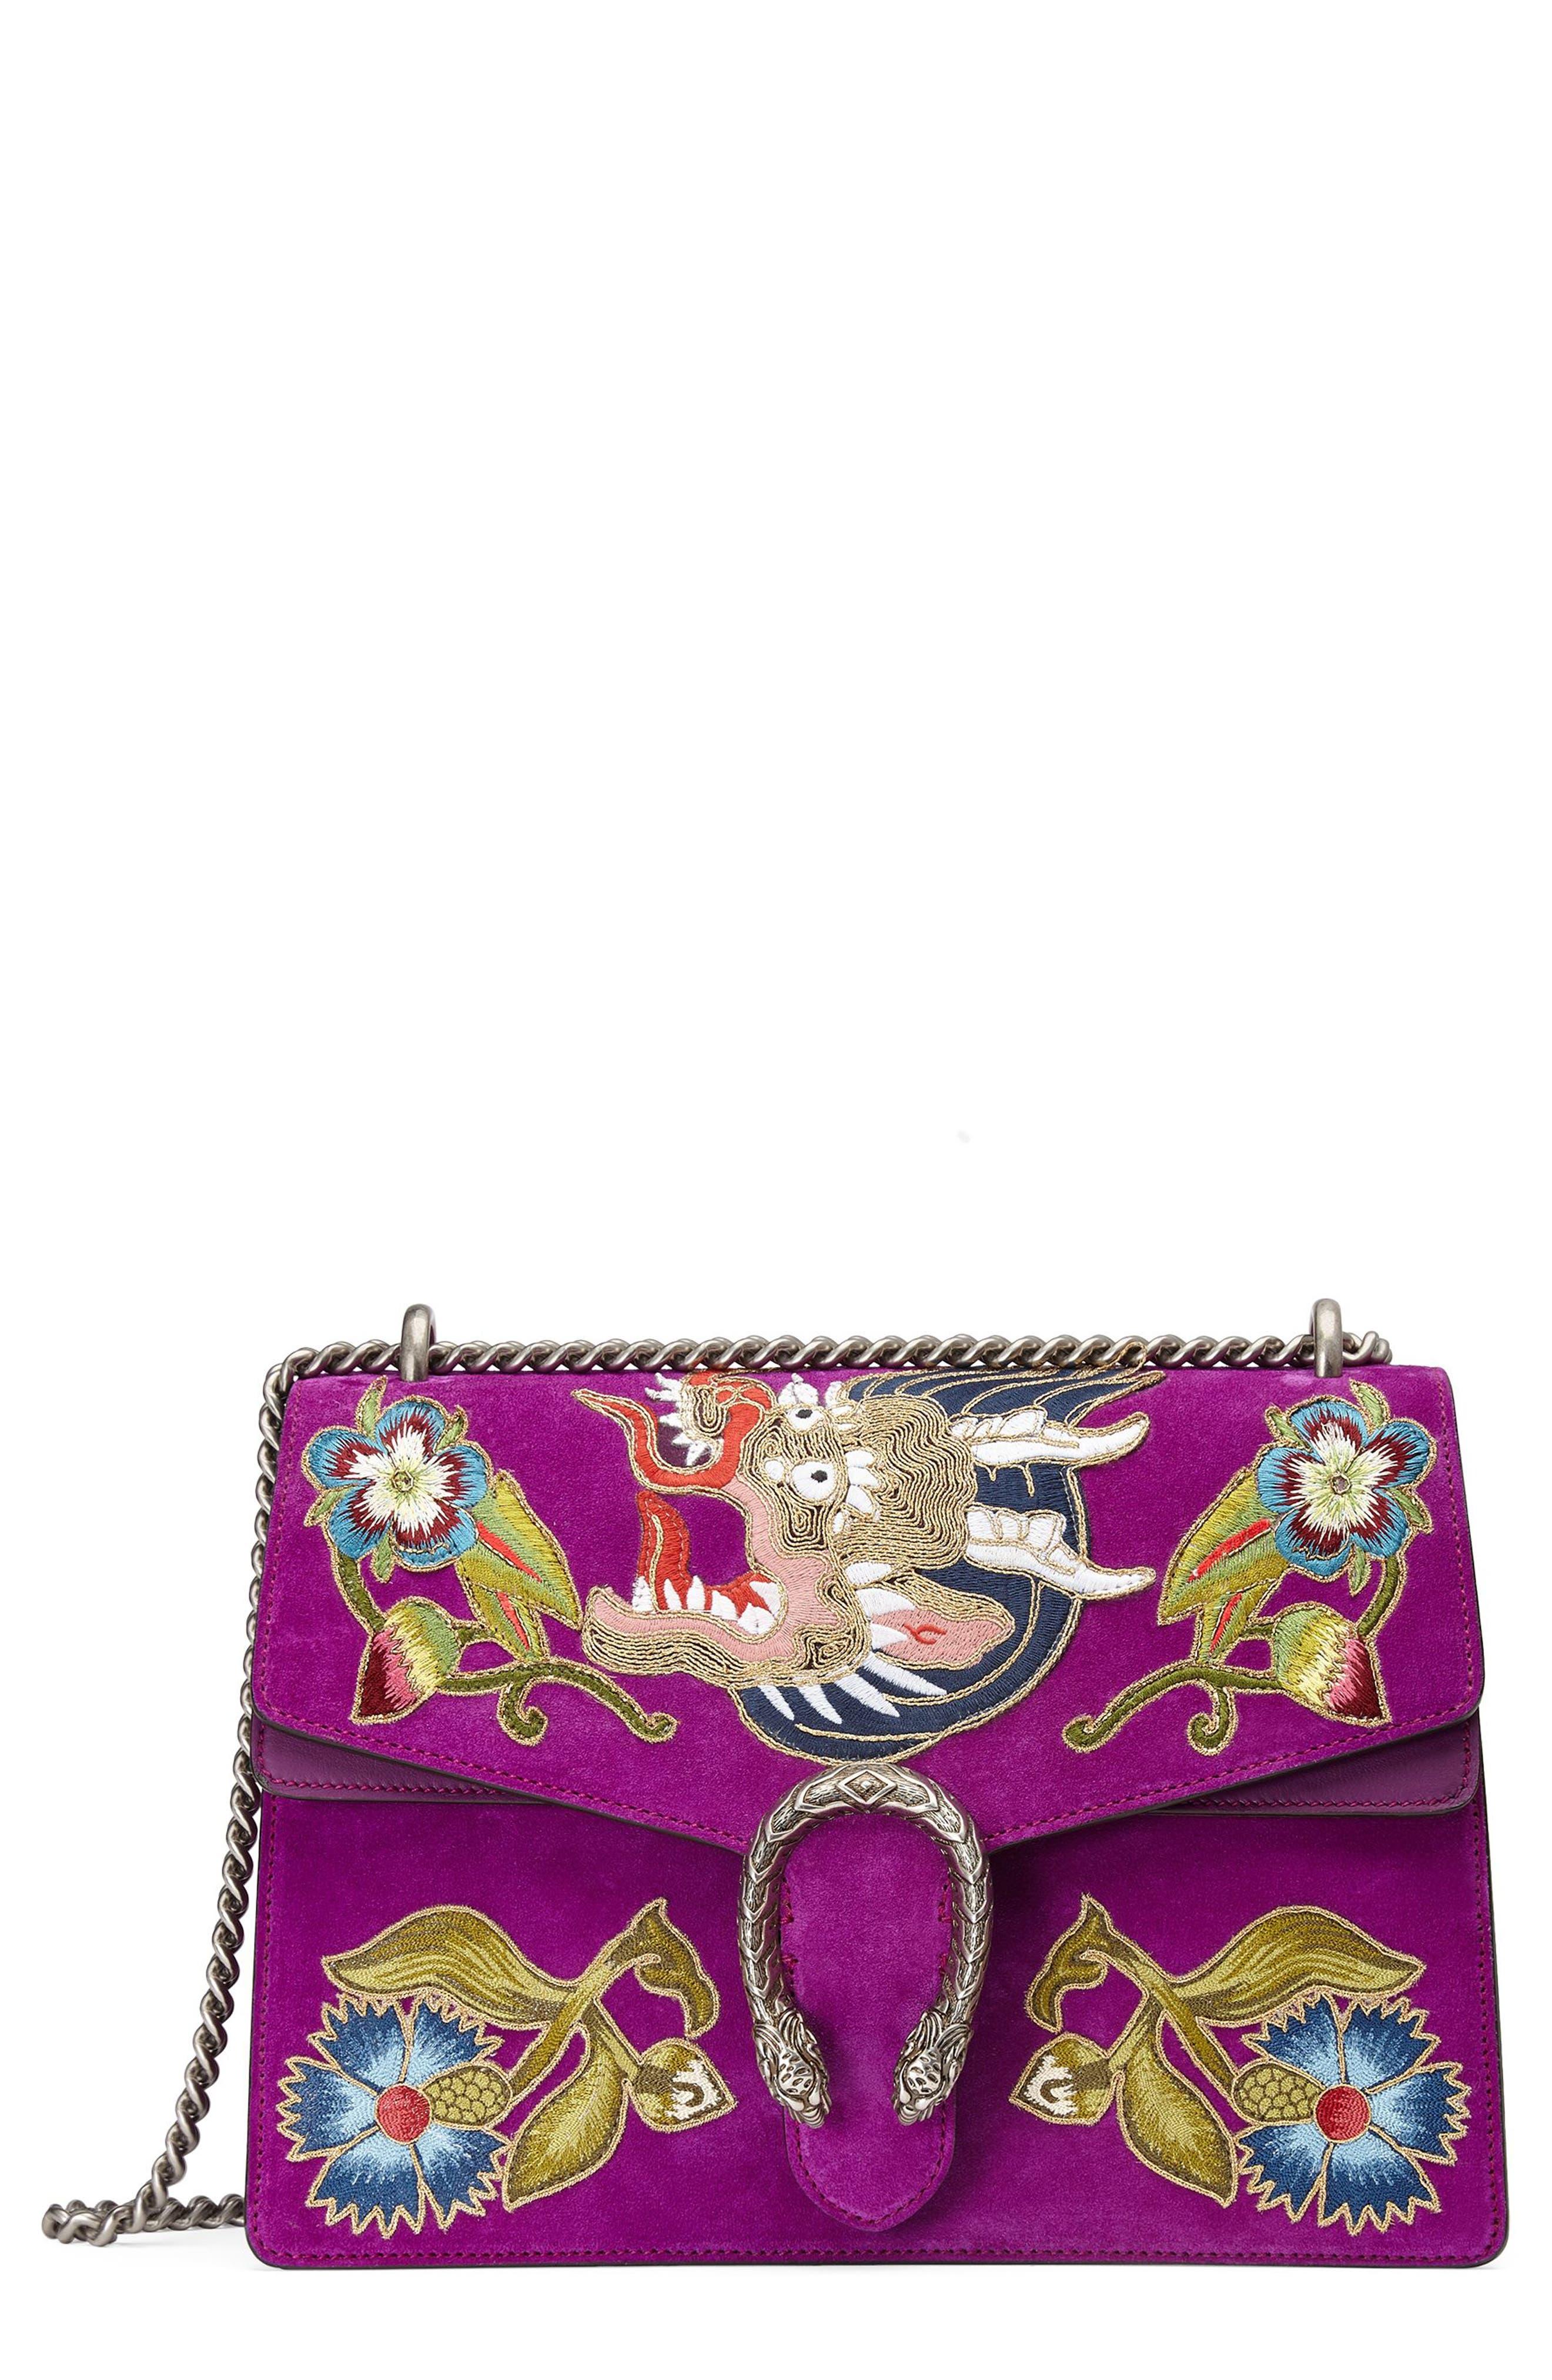 Dionysus Suede Shoulder Bag,                             Main thumbnail 1, color,                             PURPLE/MULTI